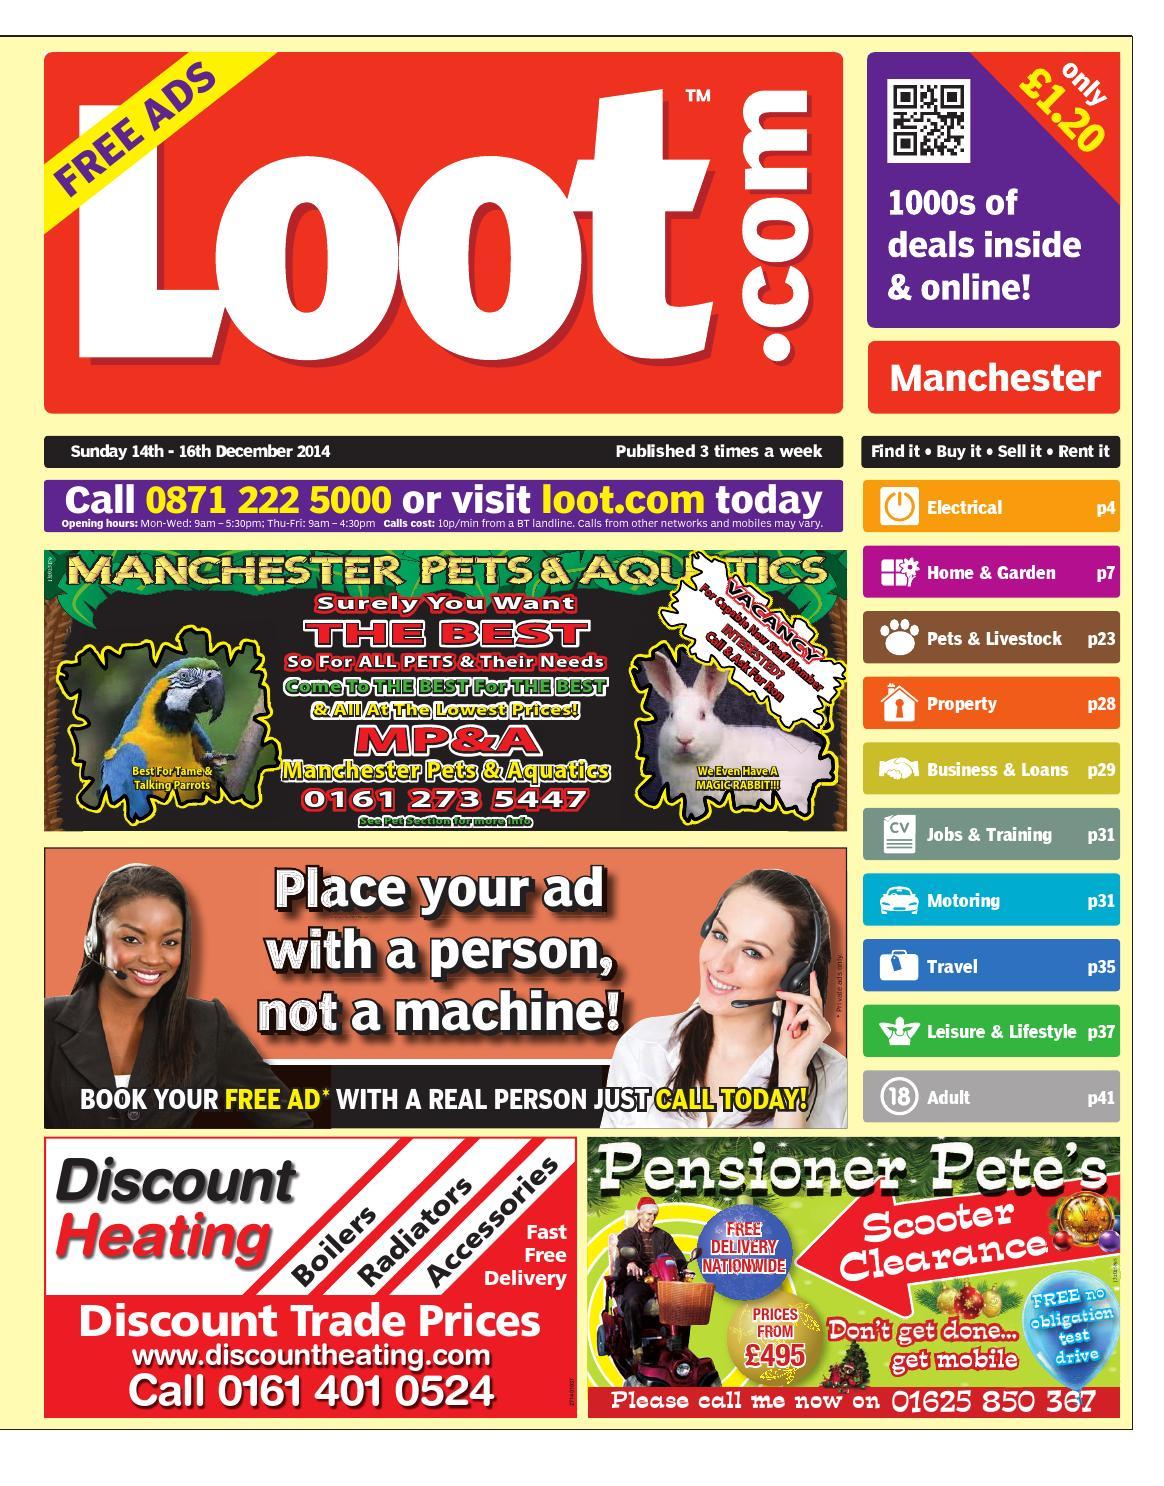 483881cc87b Loot Manchester